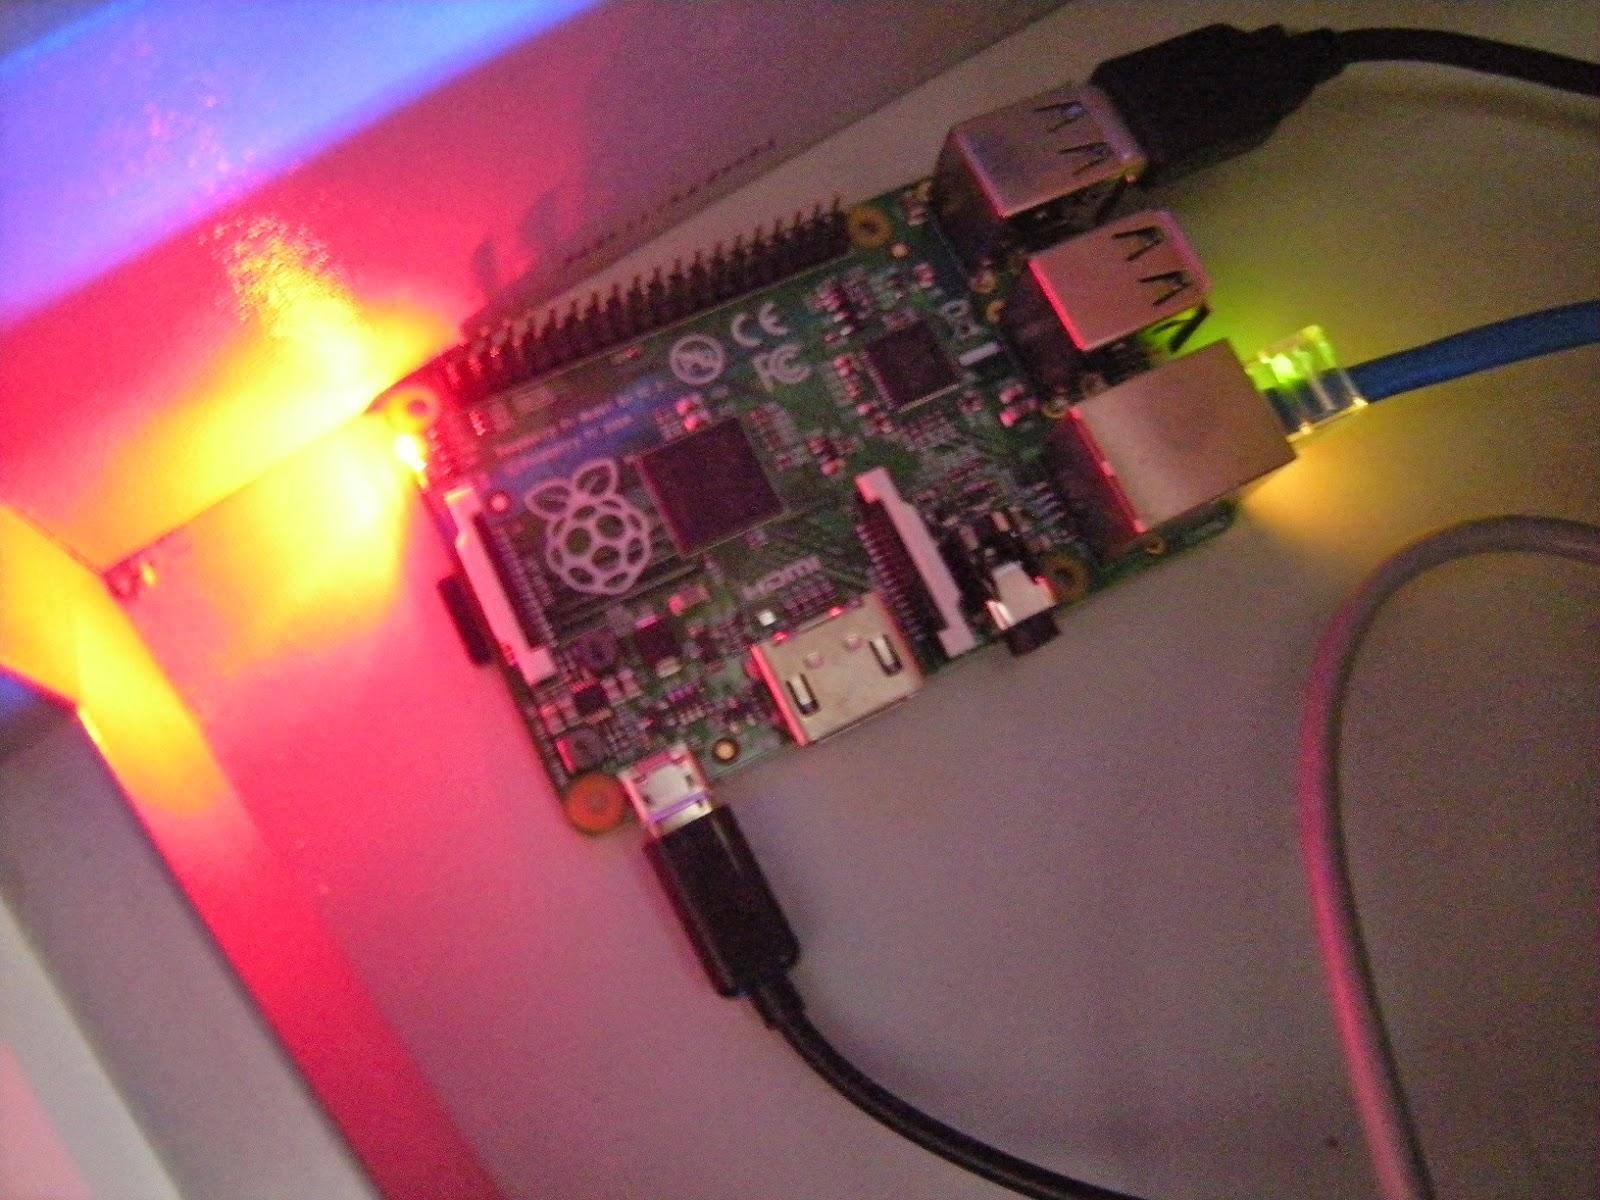 Massimo's Blog: Setting up a DLNA media server on the Raspberry Pi